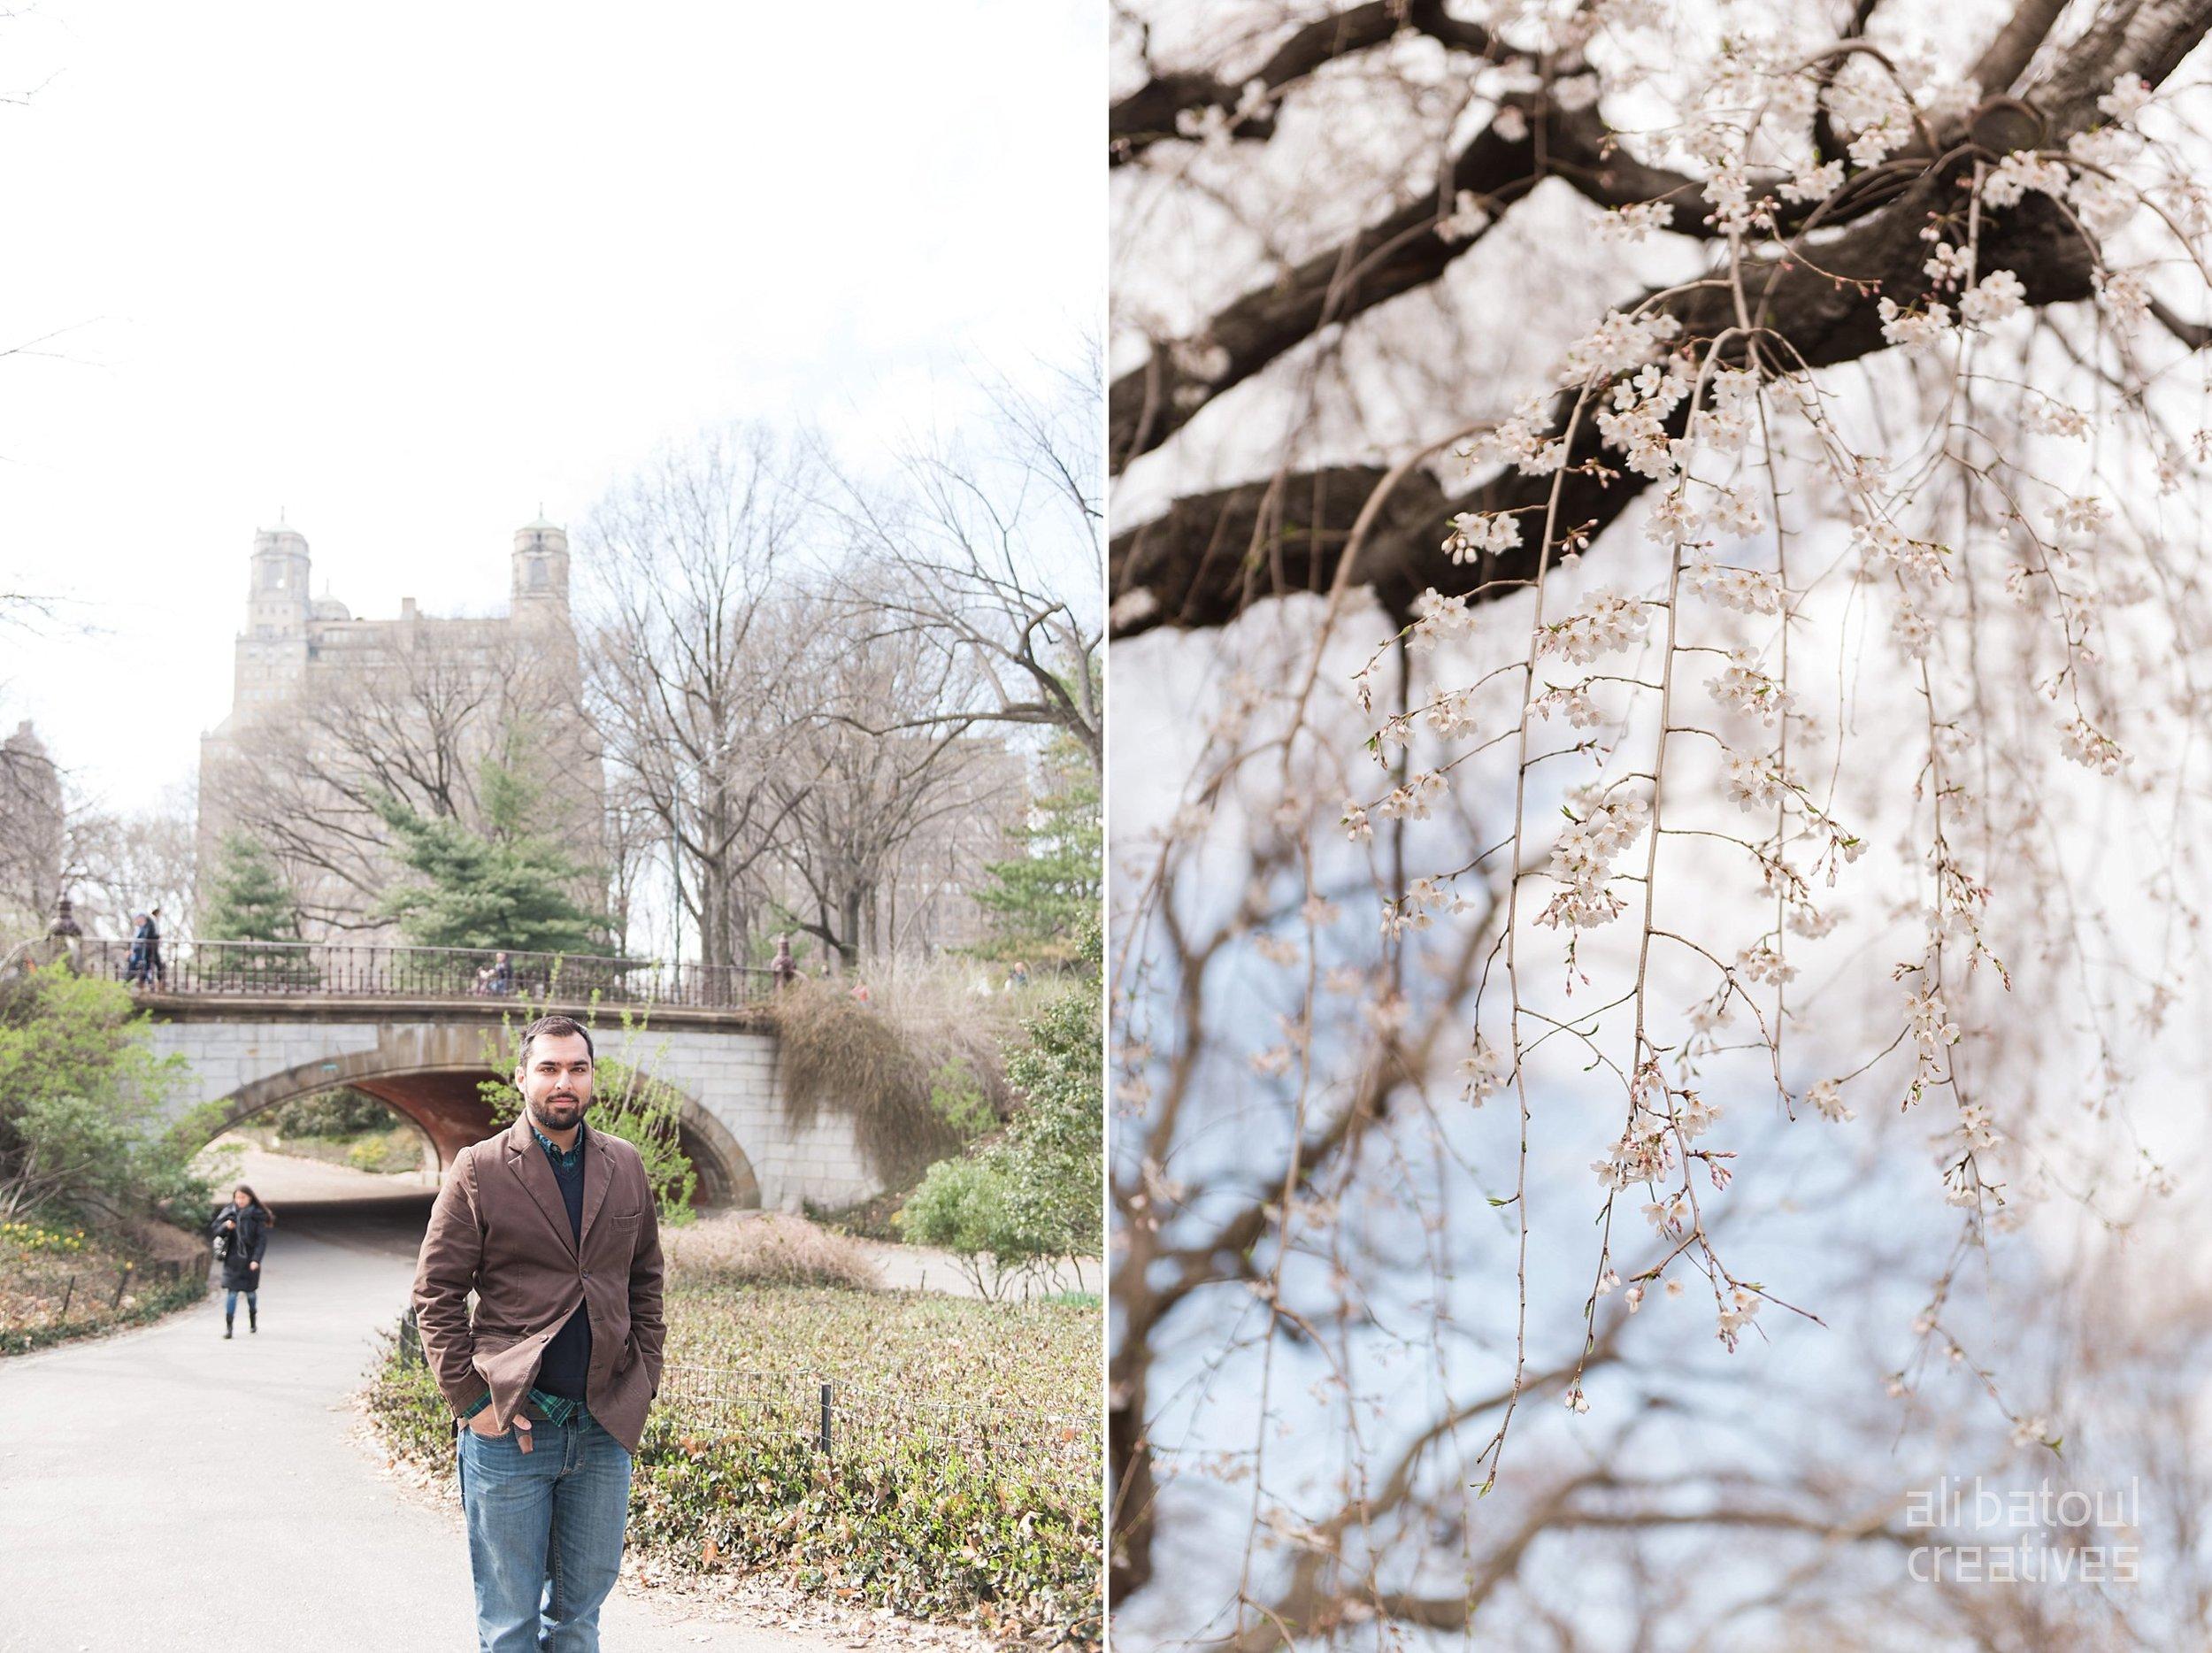 New York Trip - Ali Batoul Creatives Photography_0005.jpg